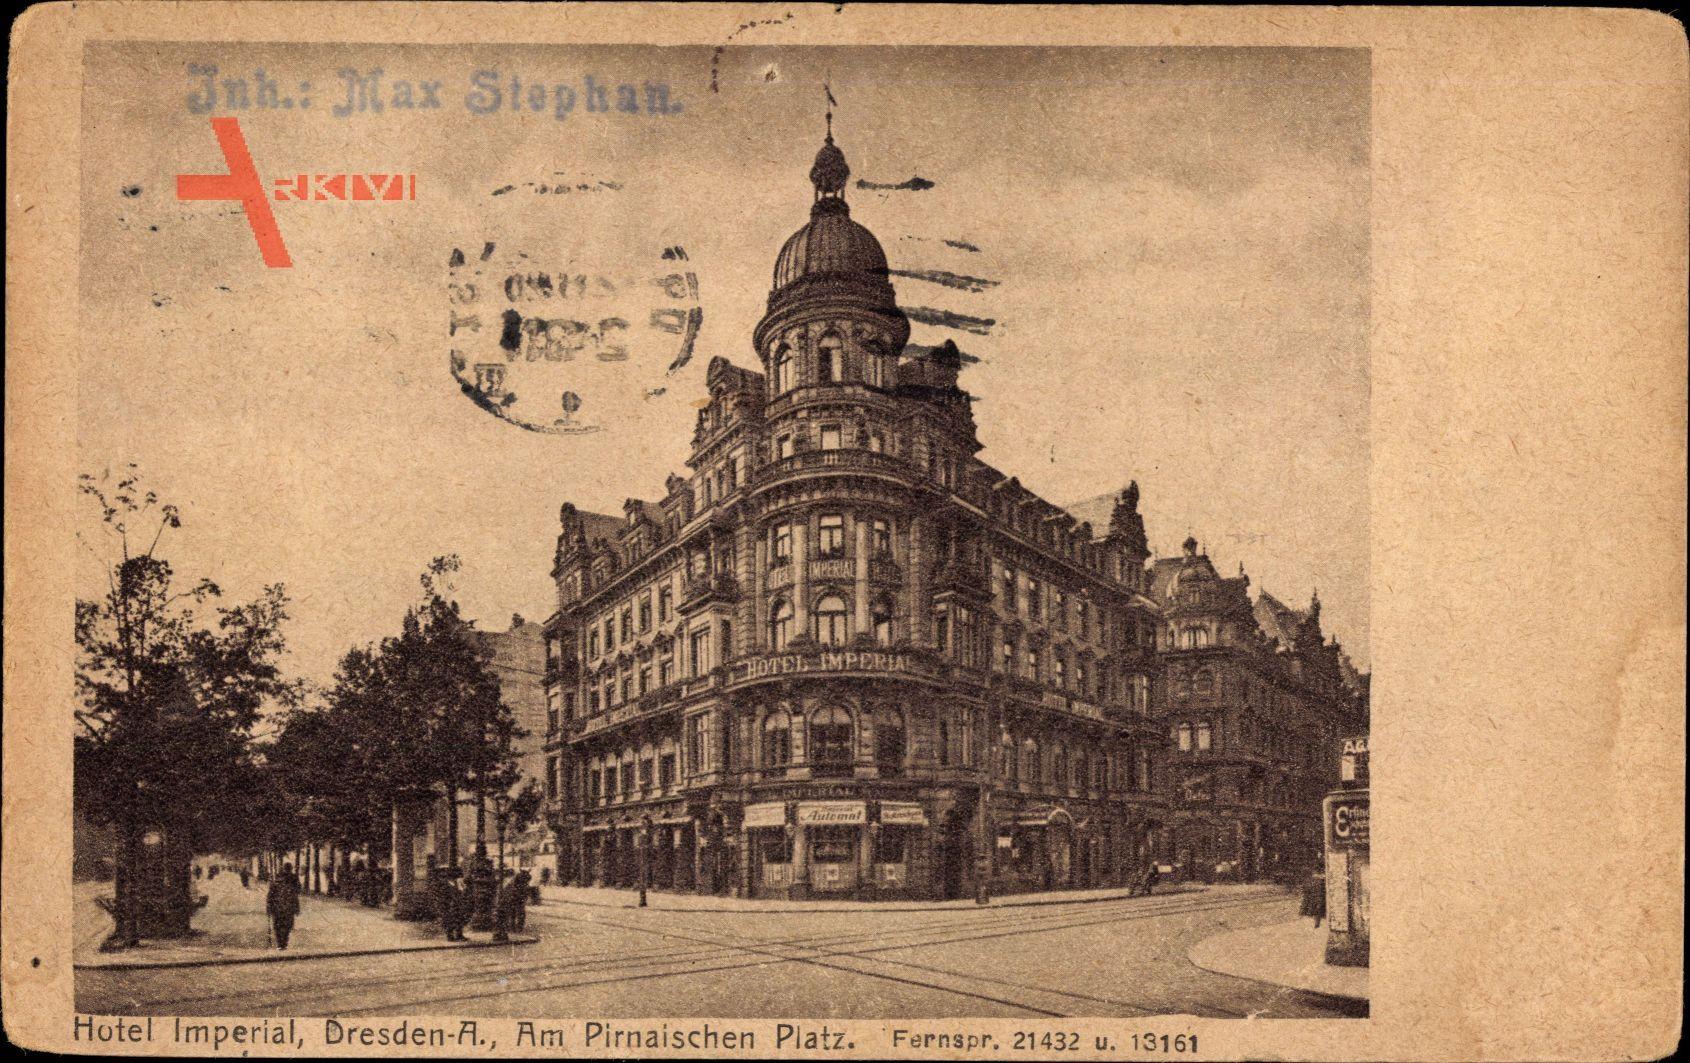 Dresden altstadt hotel imperial am pirnaischen platz for Dresden altstadt hotel